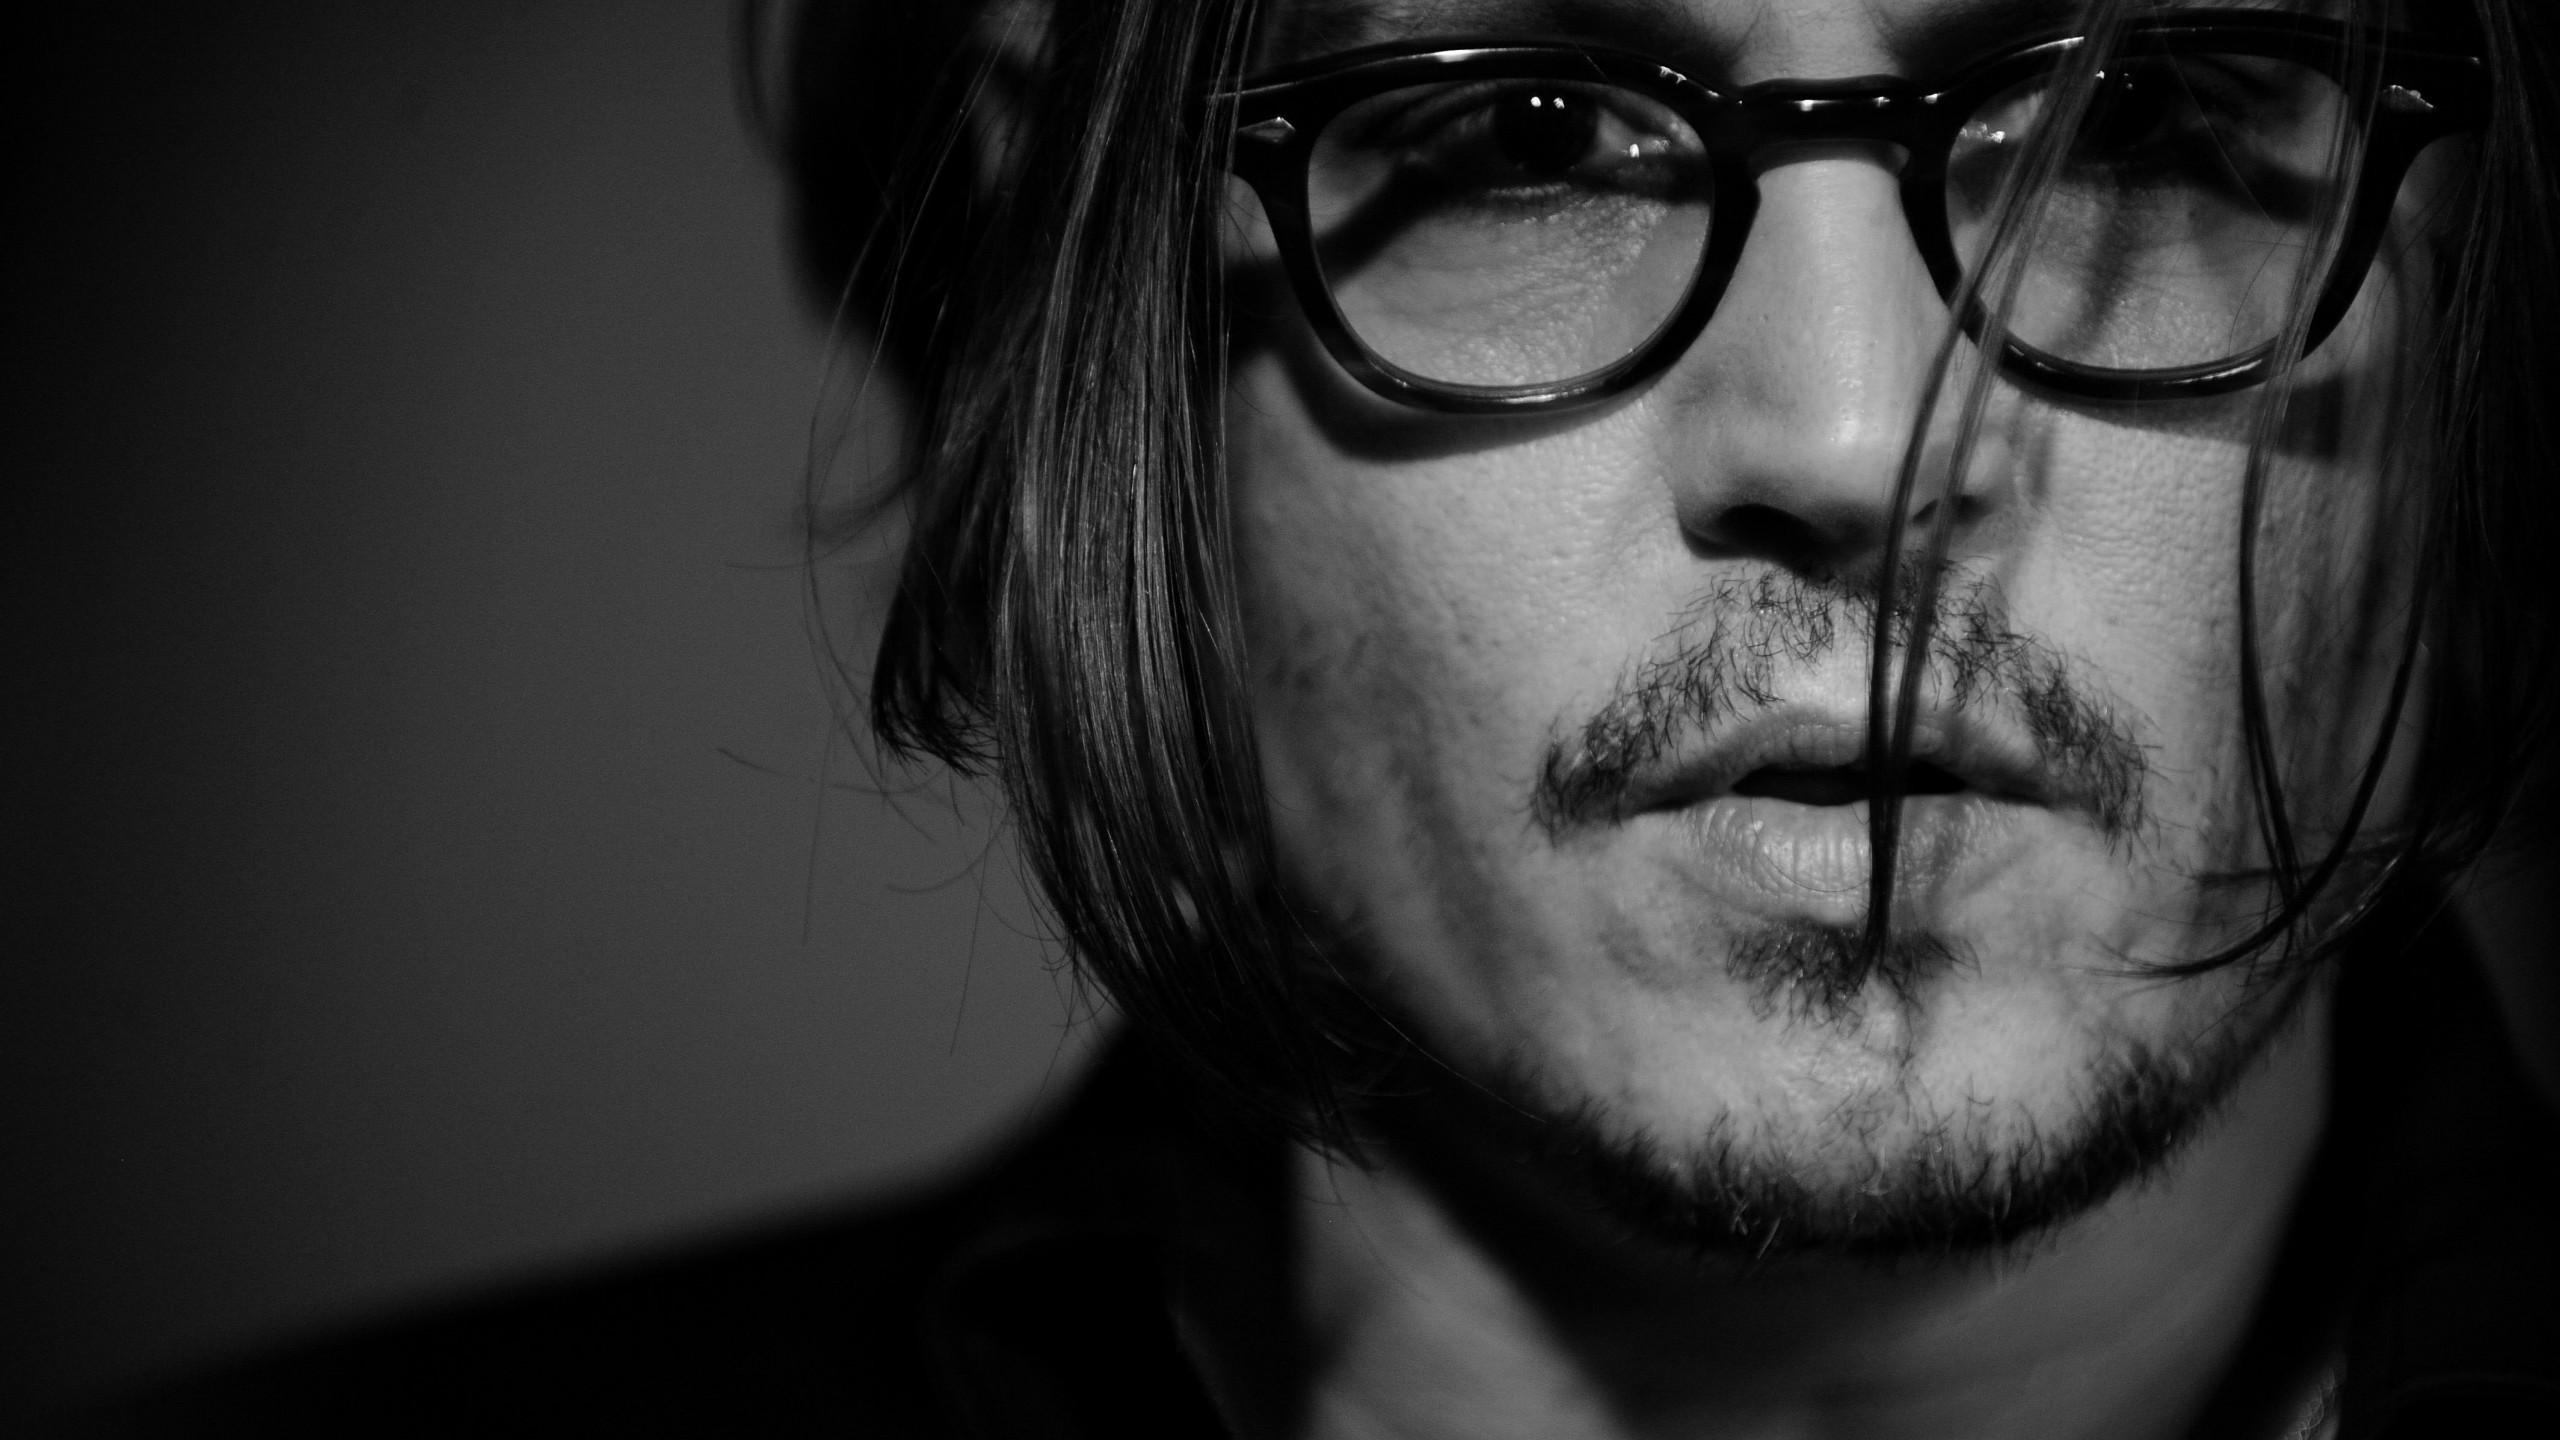 Wallpaper Johnny Depp director musician screenwriter producer 2560x1440